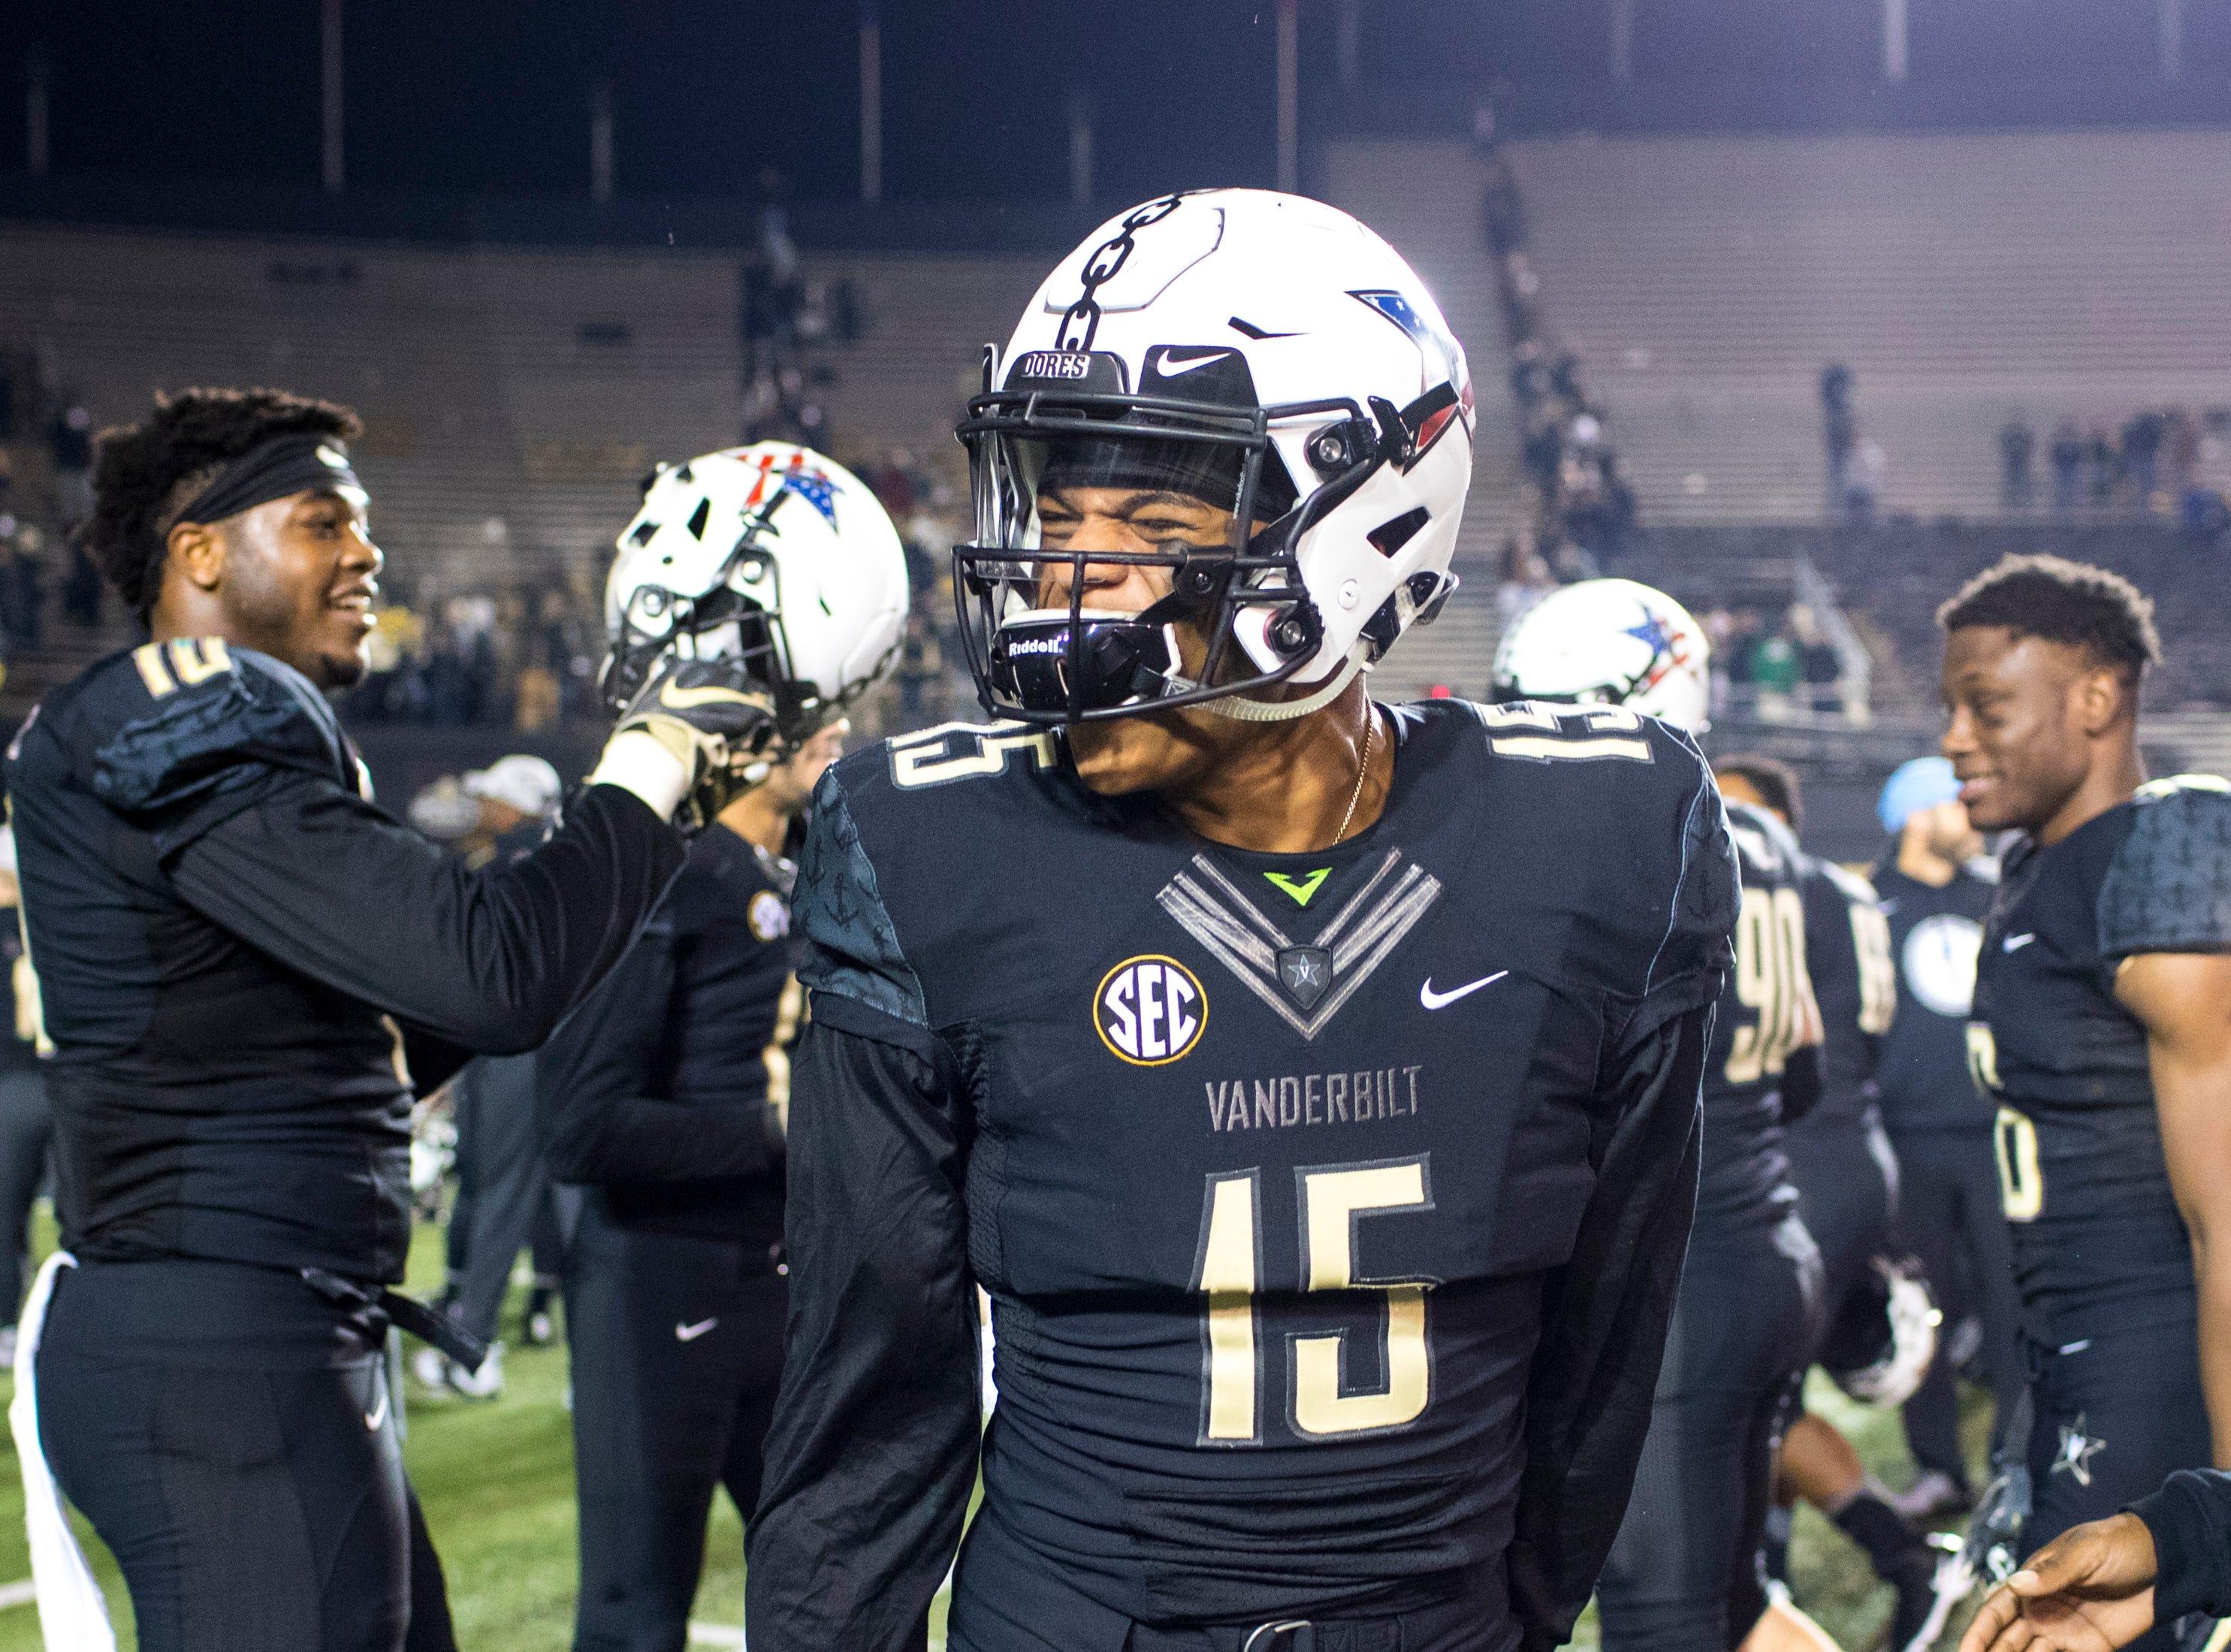 Vanderbilt defensive back Elijah Hamilton (15) celebrates after Vanderbilt's game against Ole Miss at Vanderbilt Stadium in Nashville on Saturday, Nov. 17, 2018.